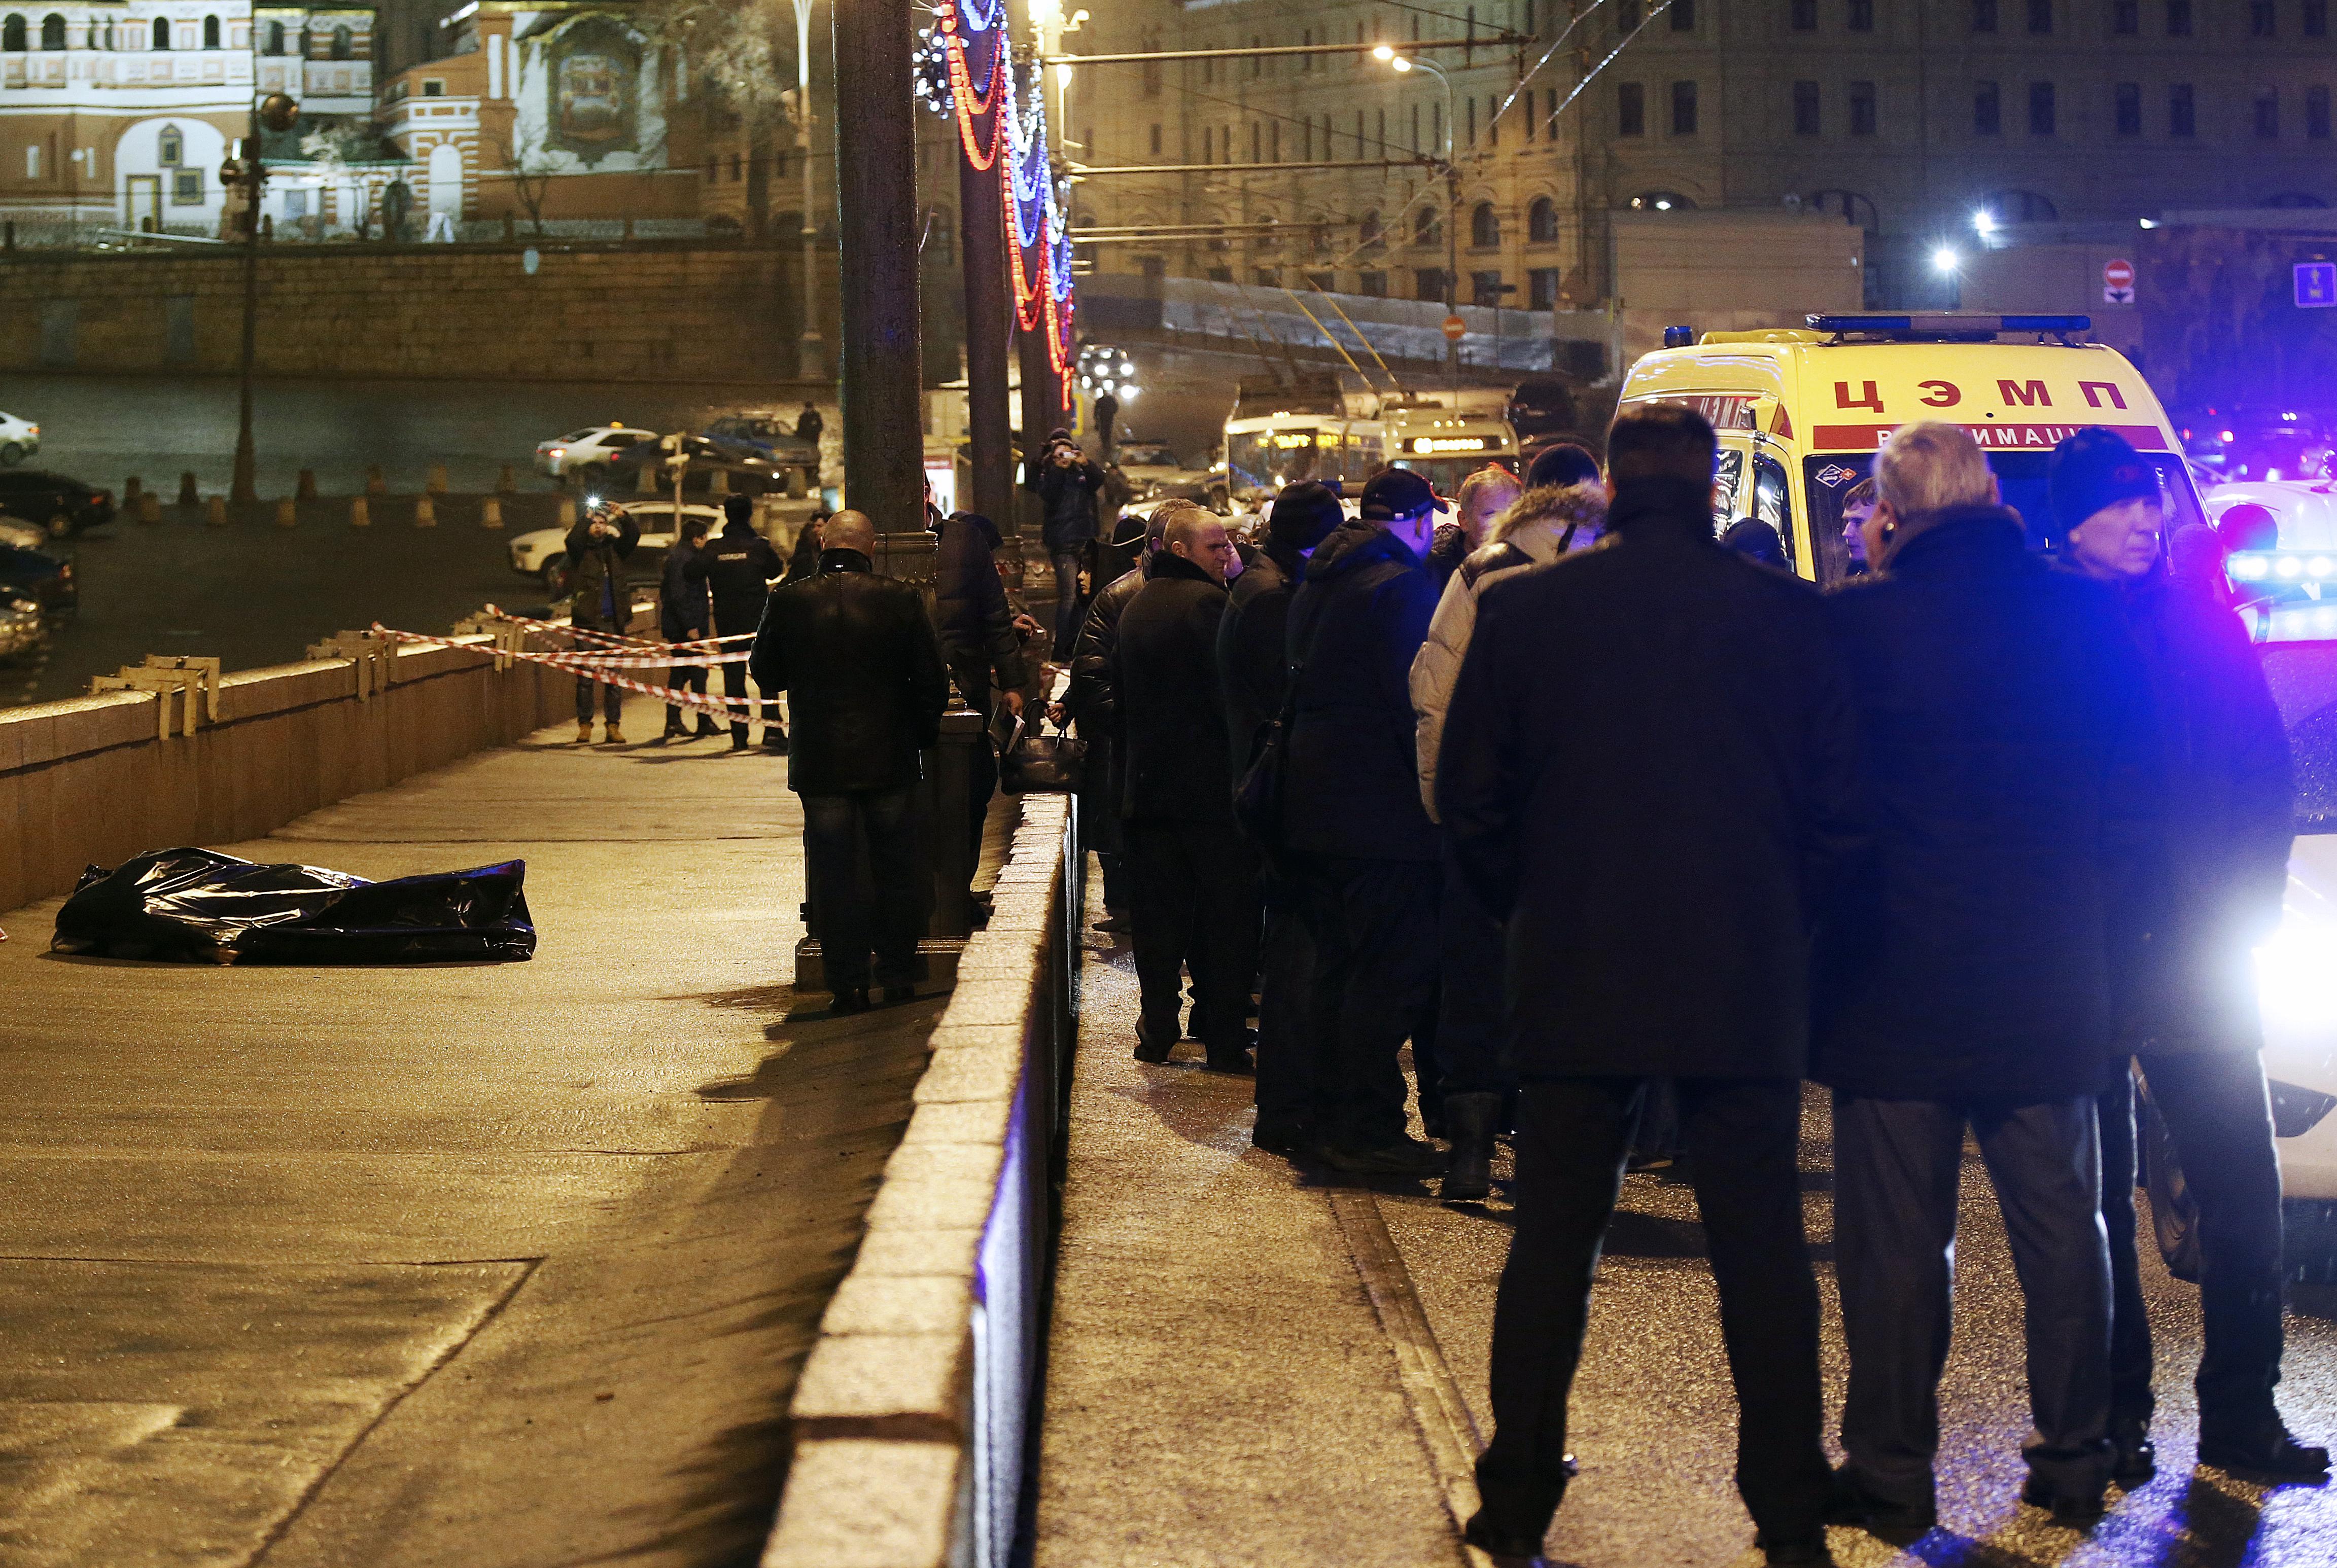 На месте убийства Бориса Немцова на Большом Москворецком мосту. Фото: ТАСС